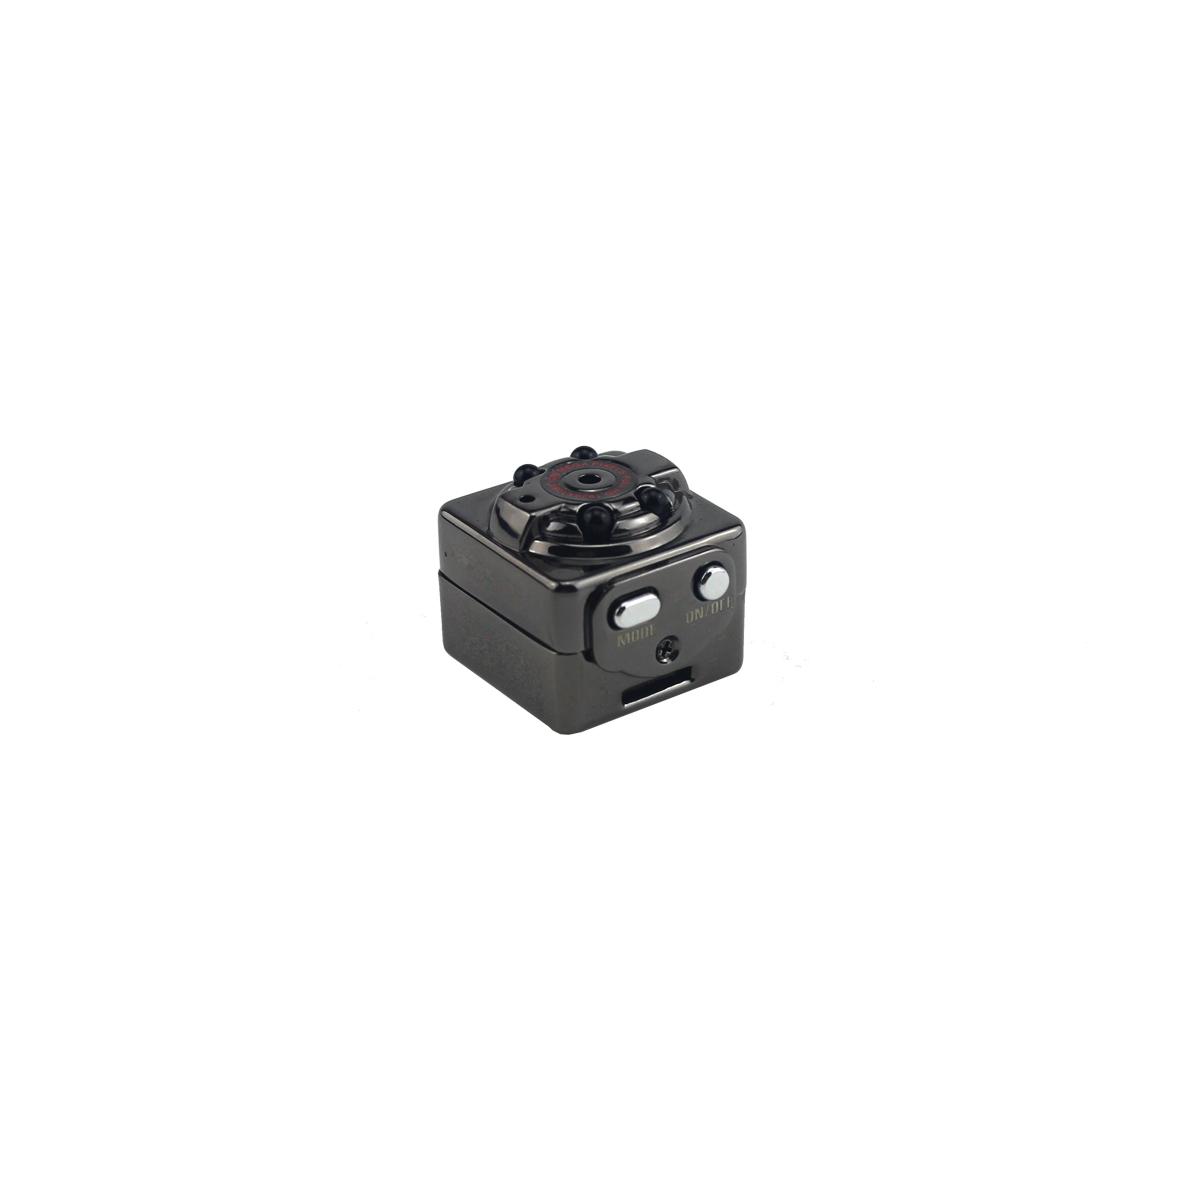 tangmi 39 s blog tangmi mini tragbare kamera full hd 1080p. Black Bedroom Furniture Sets. Home Design Ideas